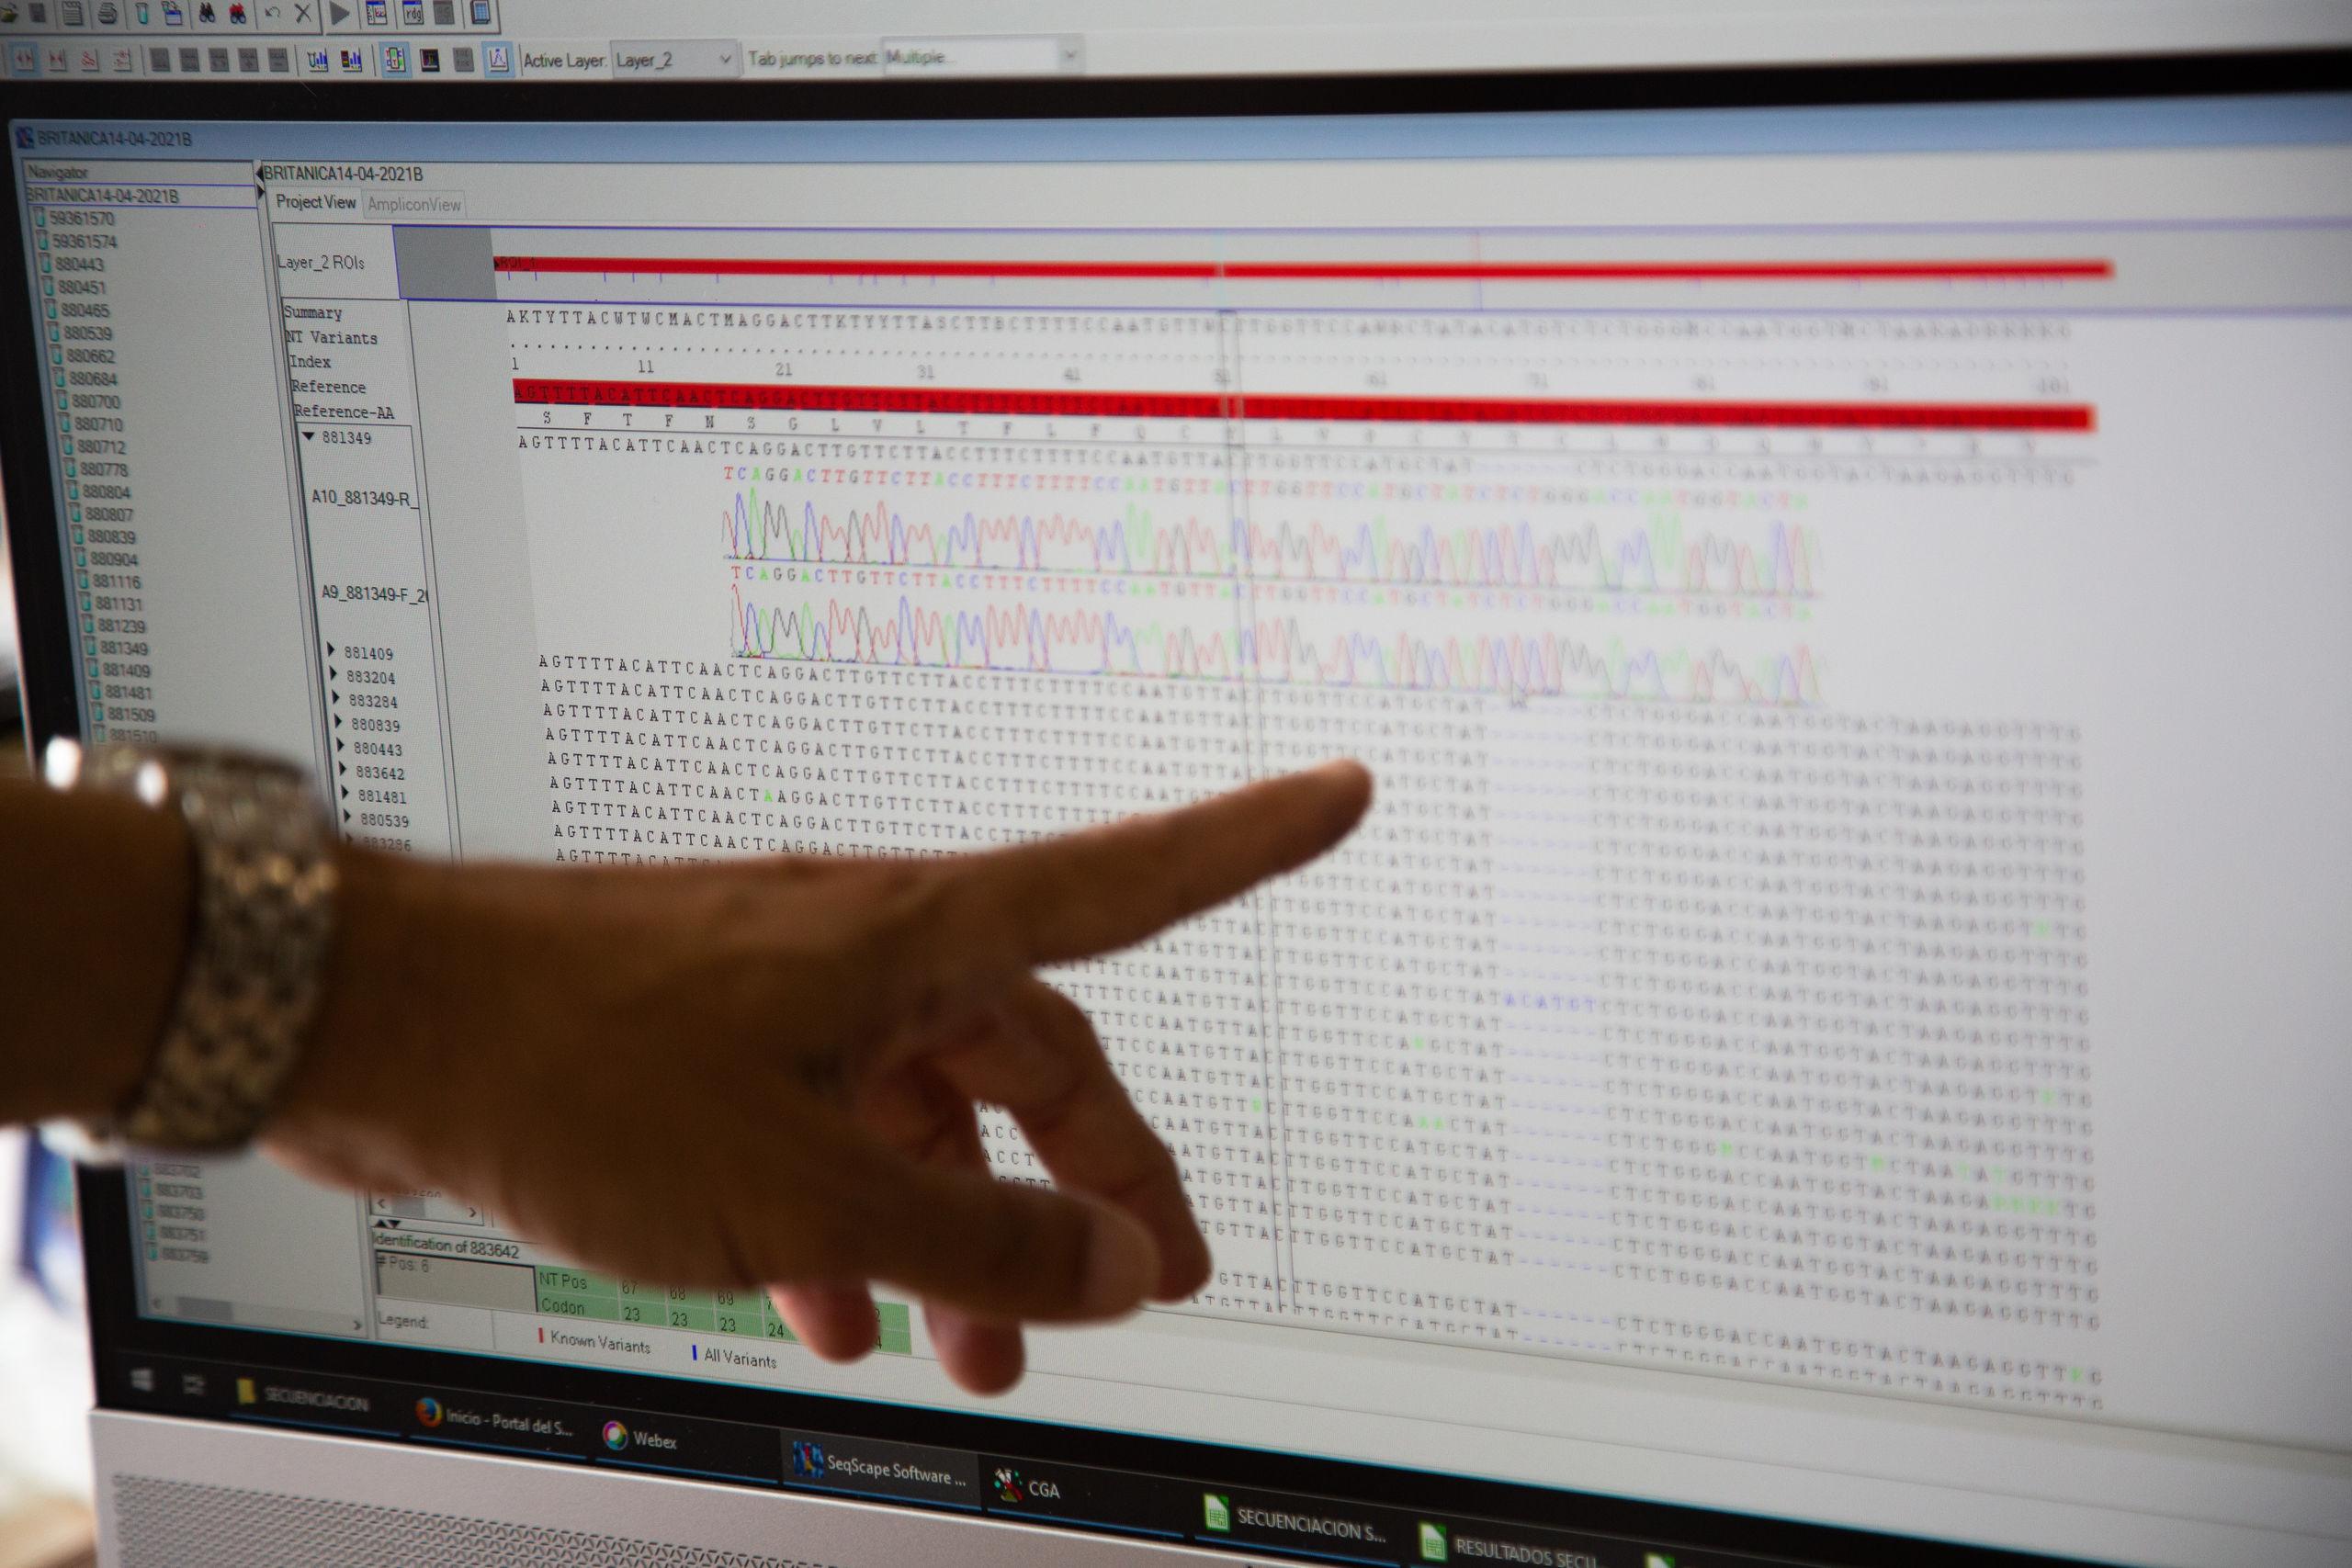 investigadora-busca-variantes-hospital-badajoz-030621.jpg